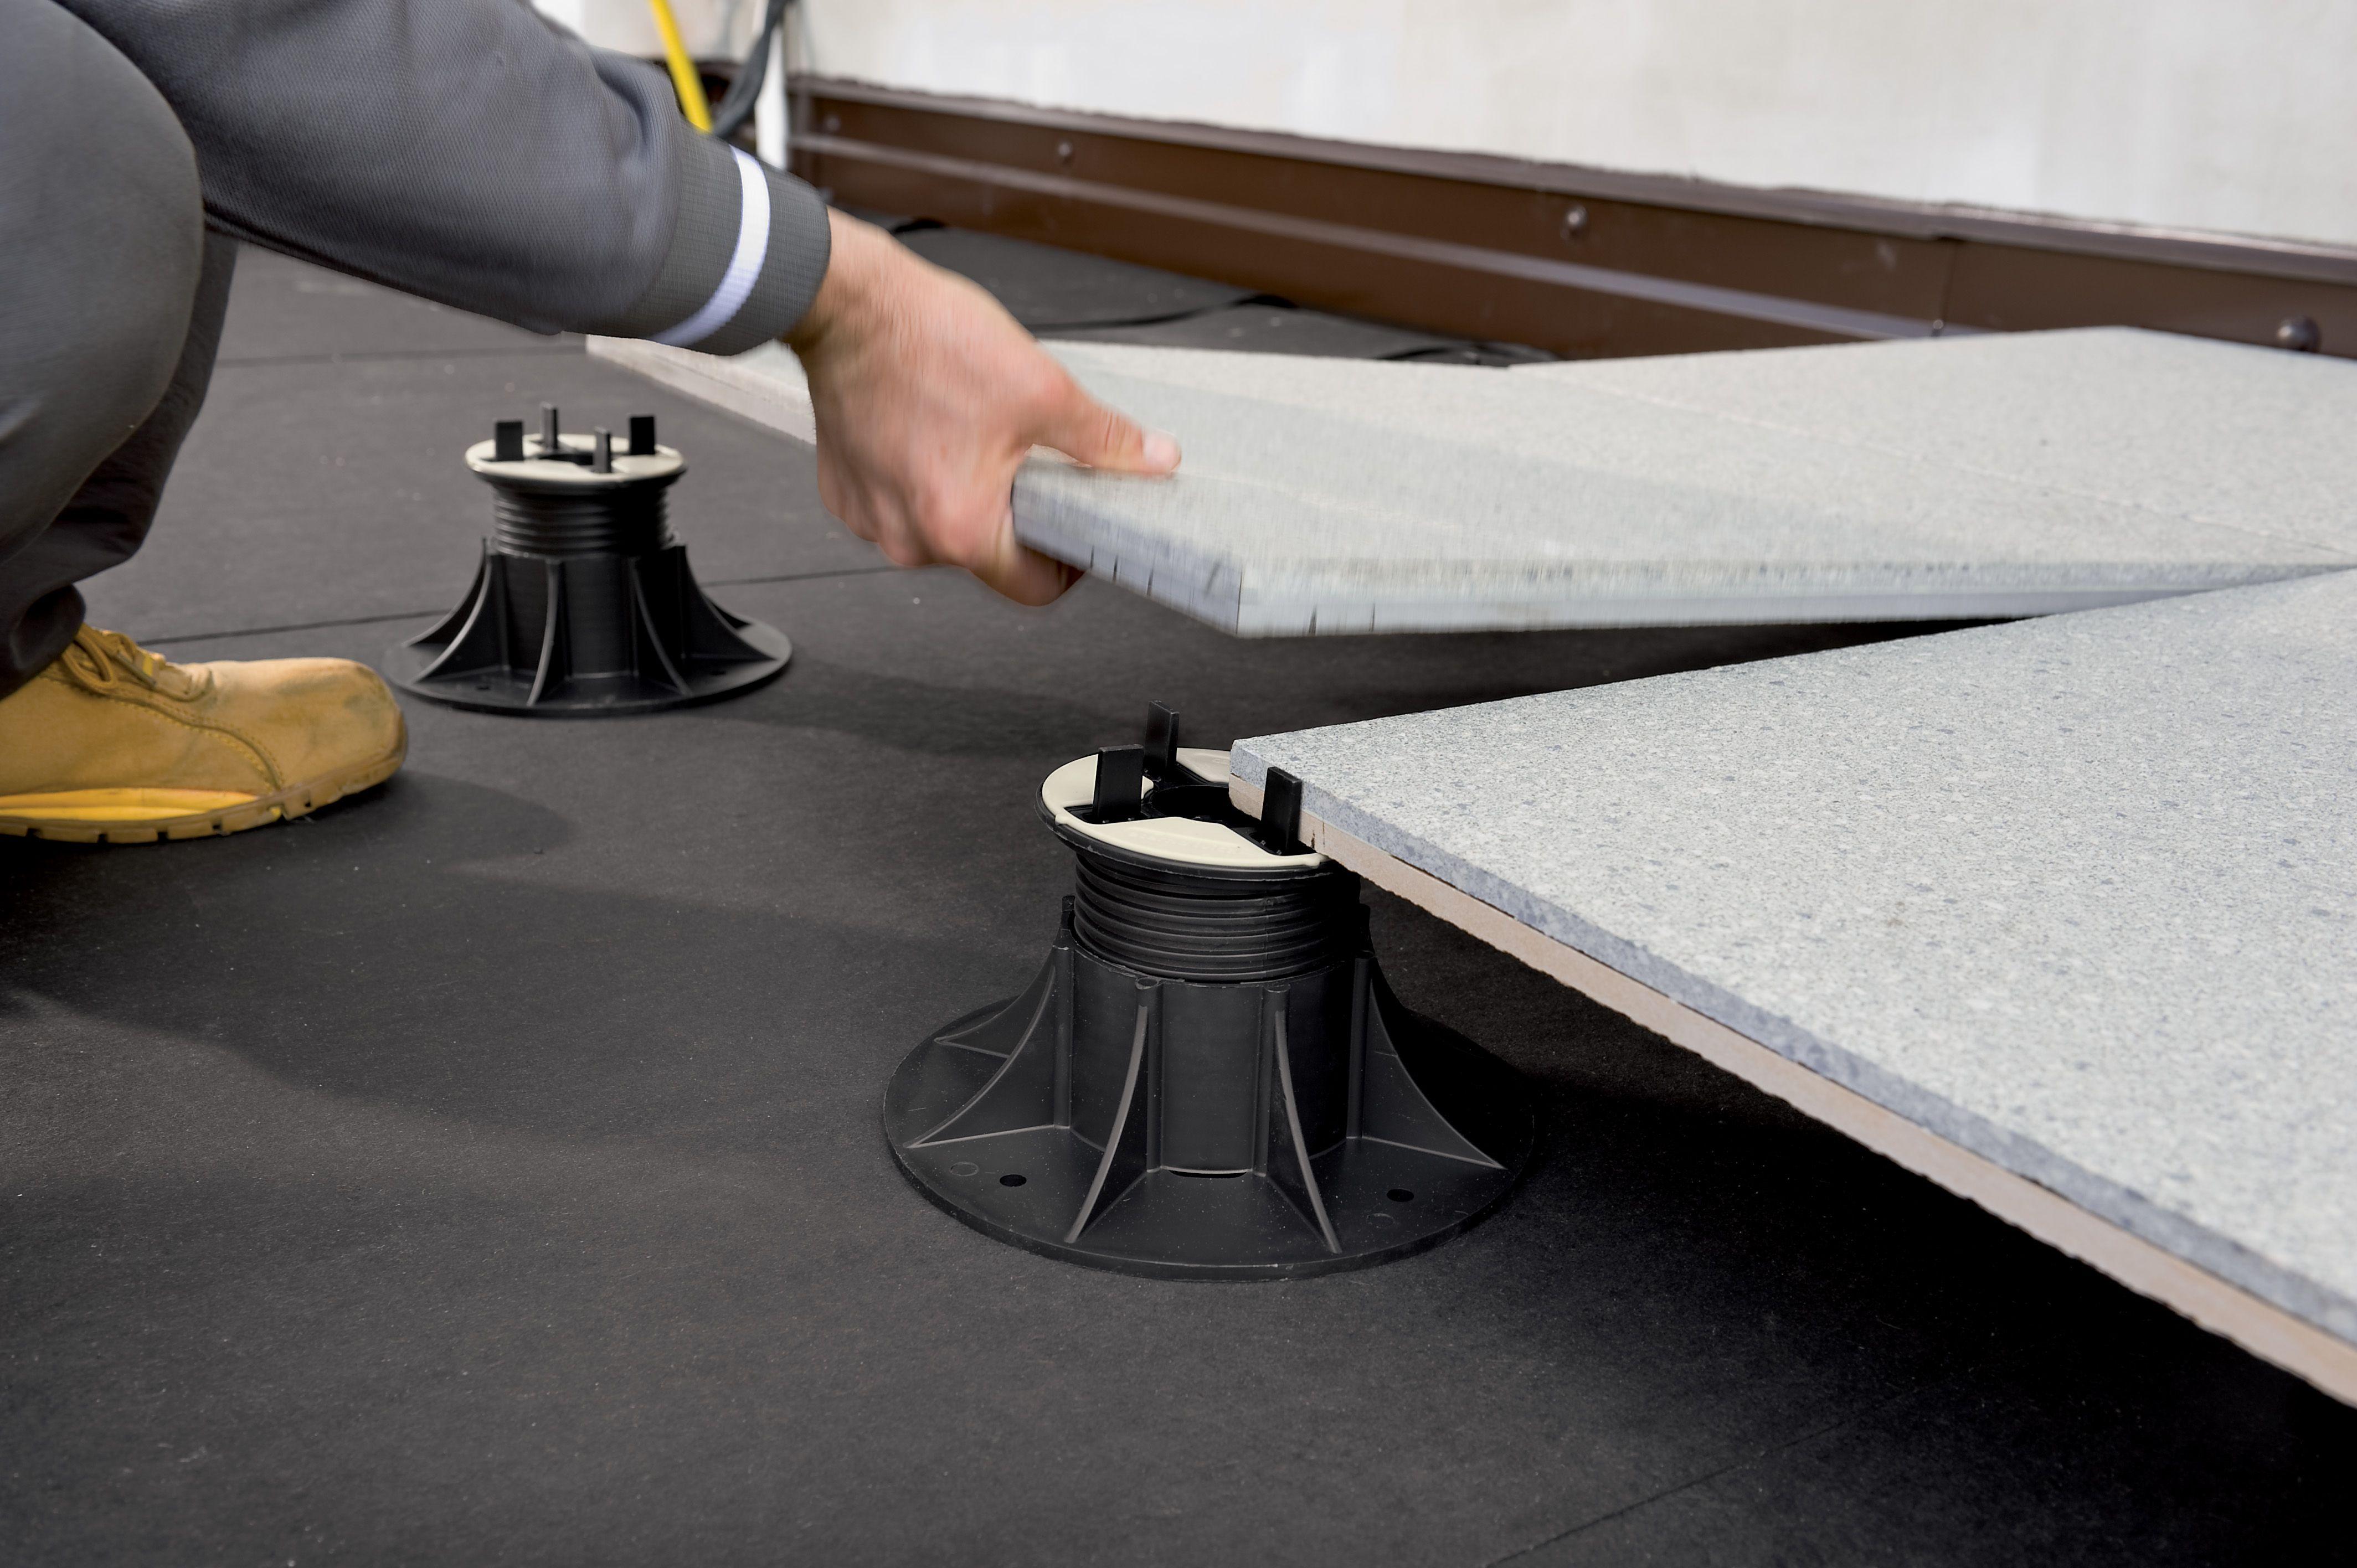 Valverdi Fixing Indoor Out Seemless Indoor And Outdoor Paving Outdoor Paving Outdoor Porcelain Tile Outdoor Tiles